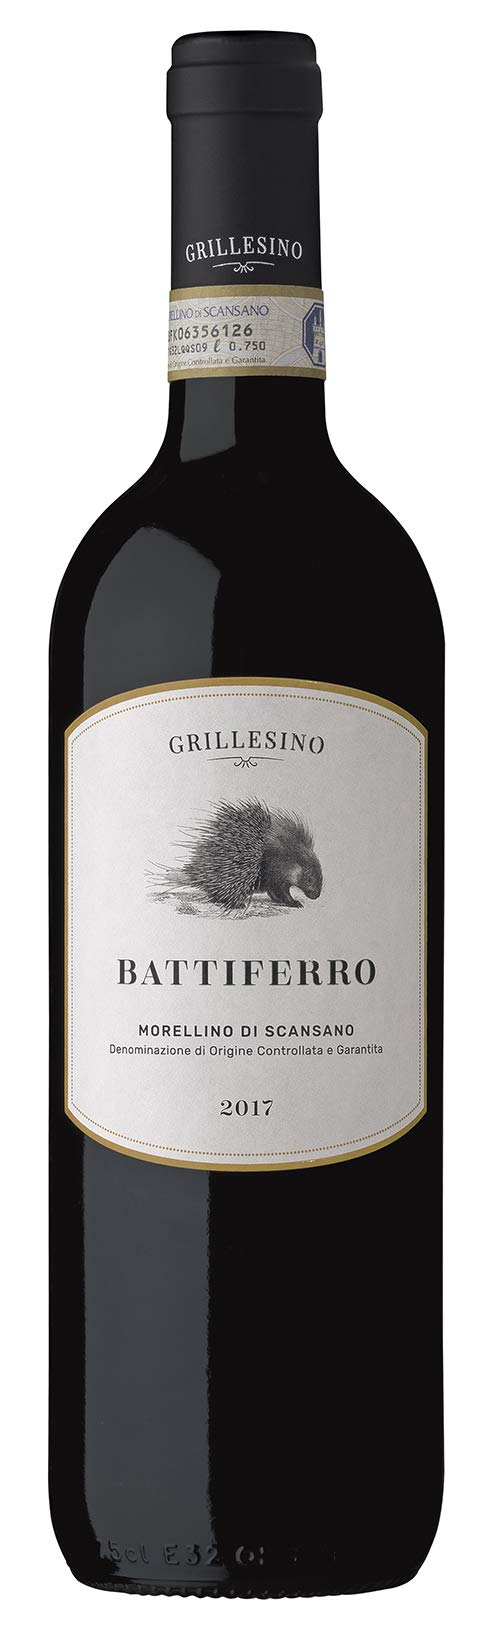 6x-075l-2017er-Grillesino-Battiferro-Morellino-di-Scansano-DOCG-Toscana-Italien-Rotwein-trocken